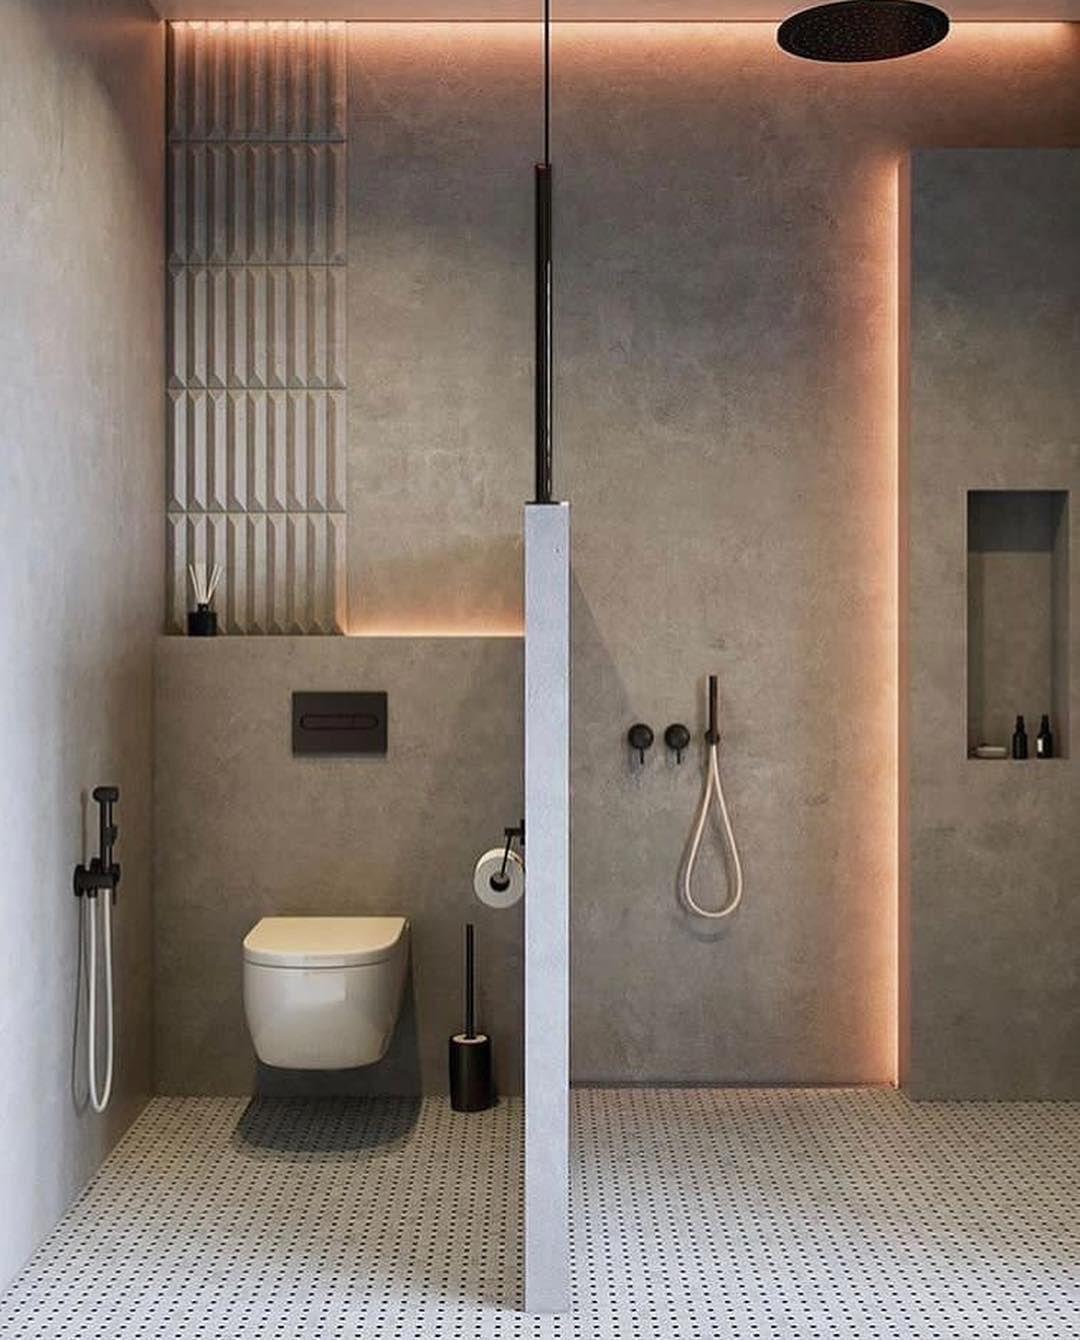 Furdoszoba Lakberendezes Modern Bathroom Minimalist Bathroom Modern Bathroom Design Minimalist bathroom lamp design